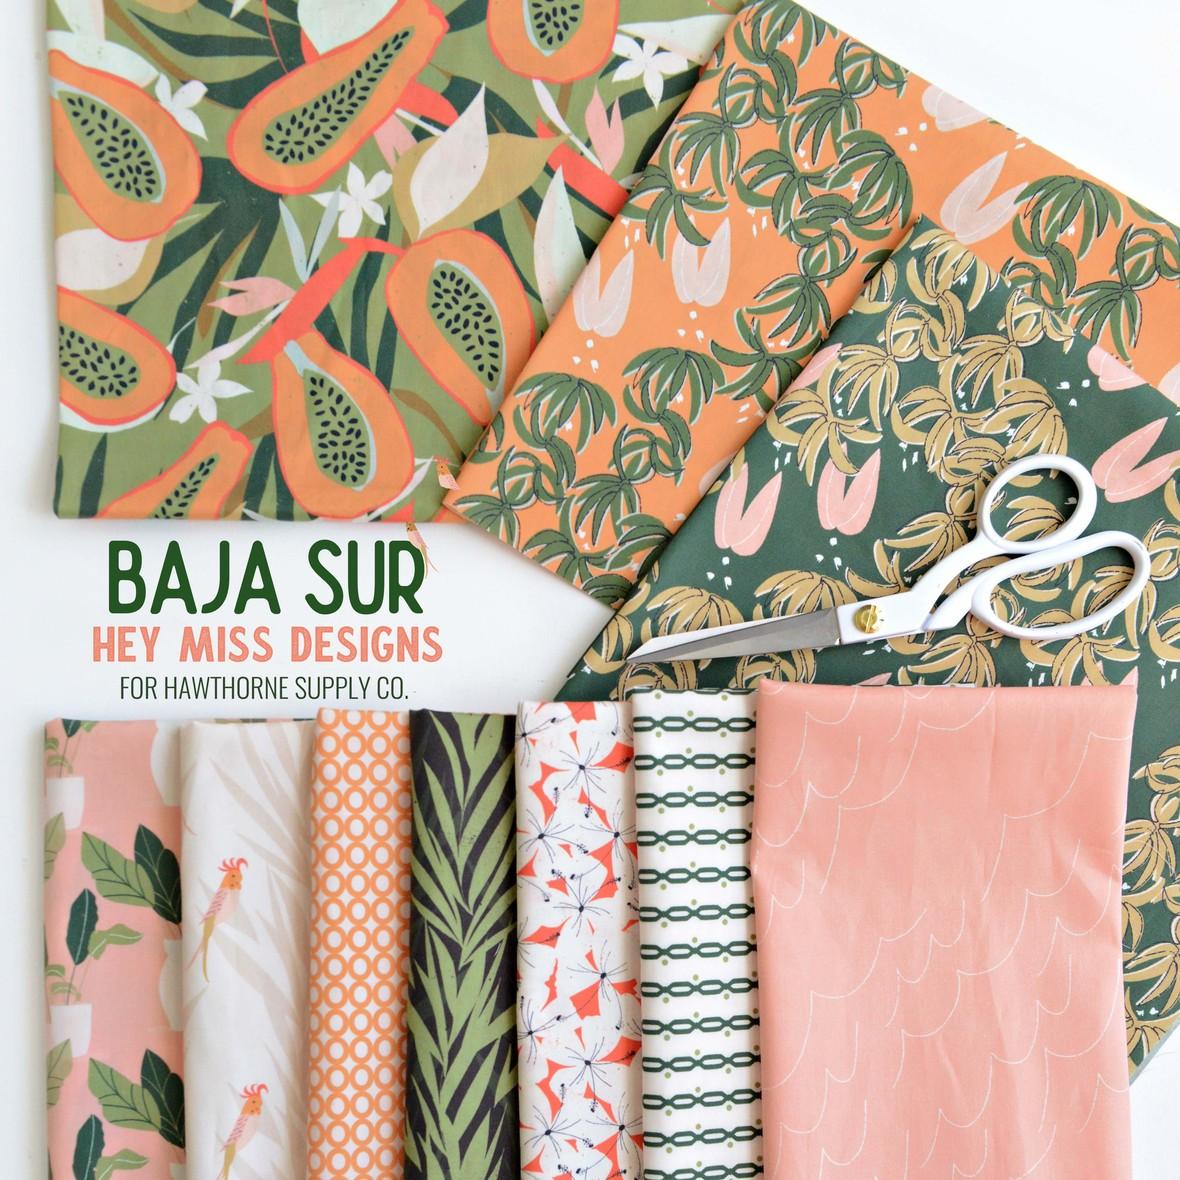 Baja Sur Hey Miss Designs at Hawthorne Supply Co